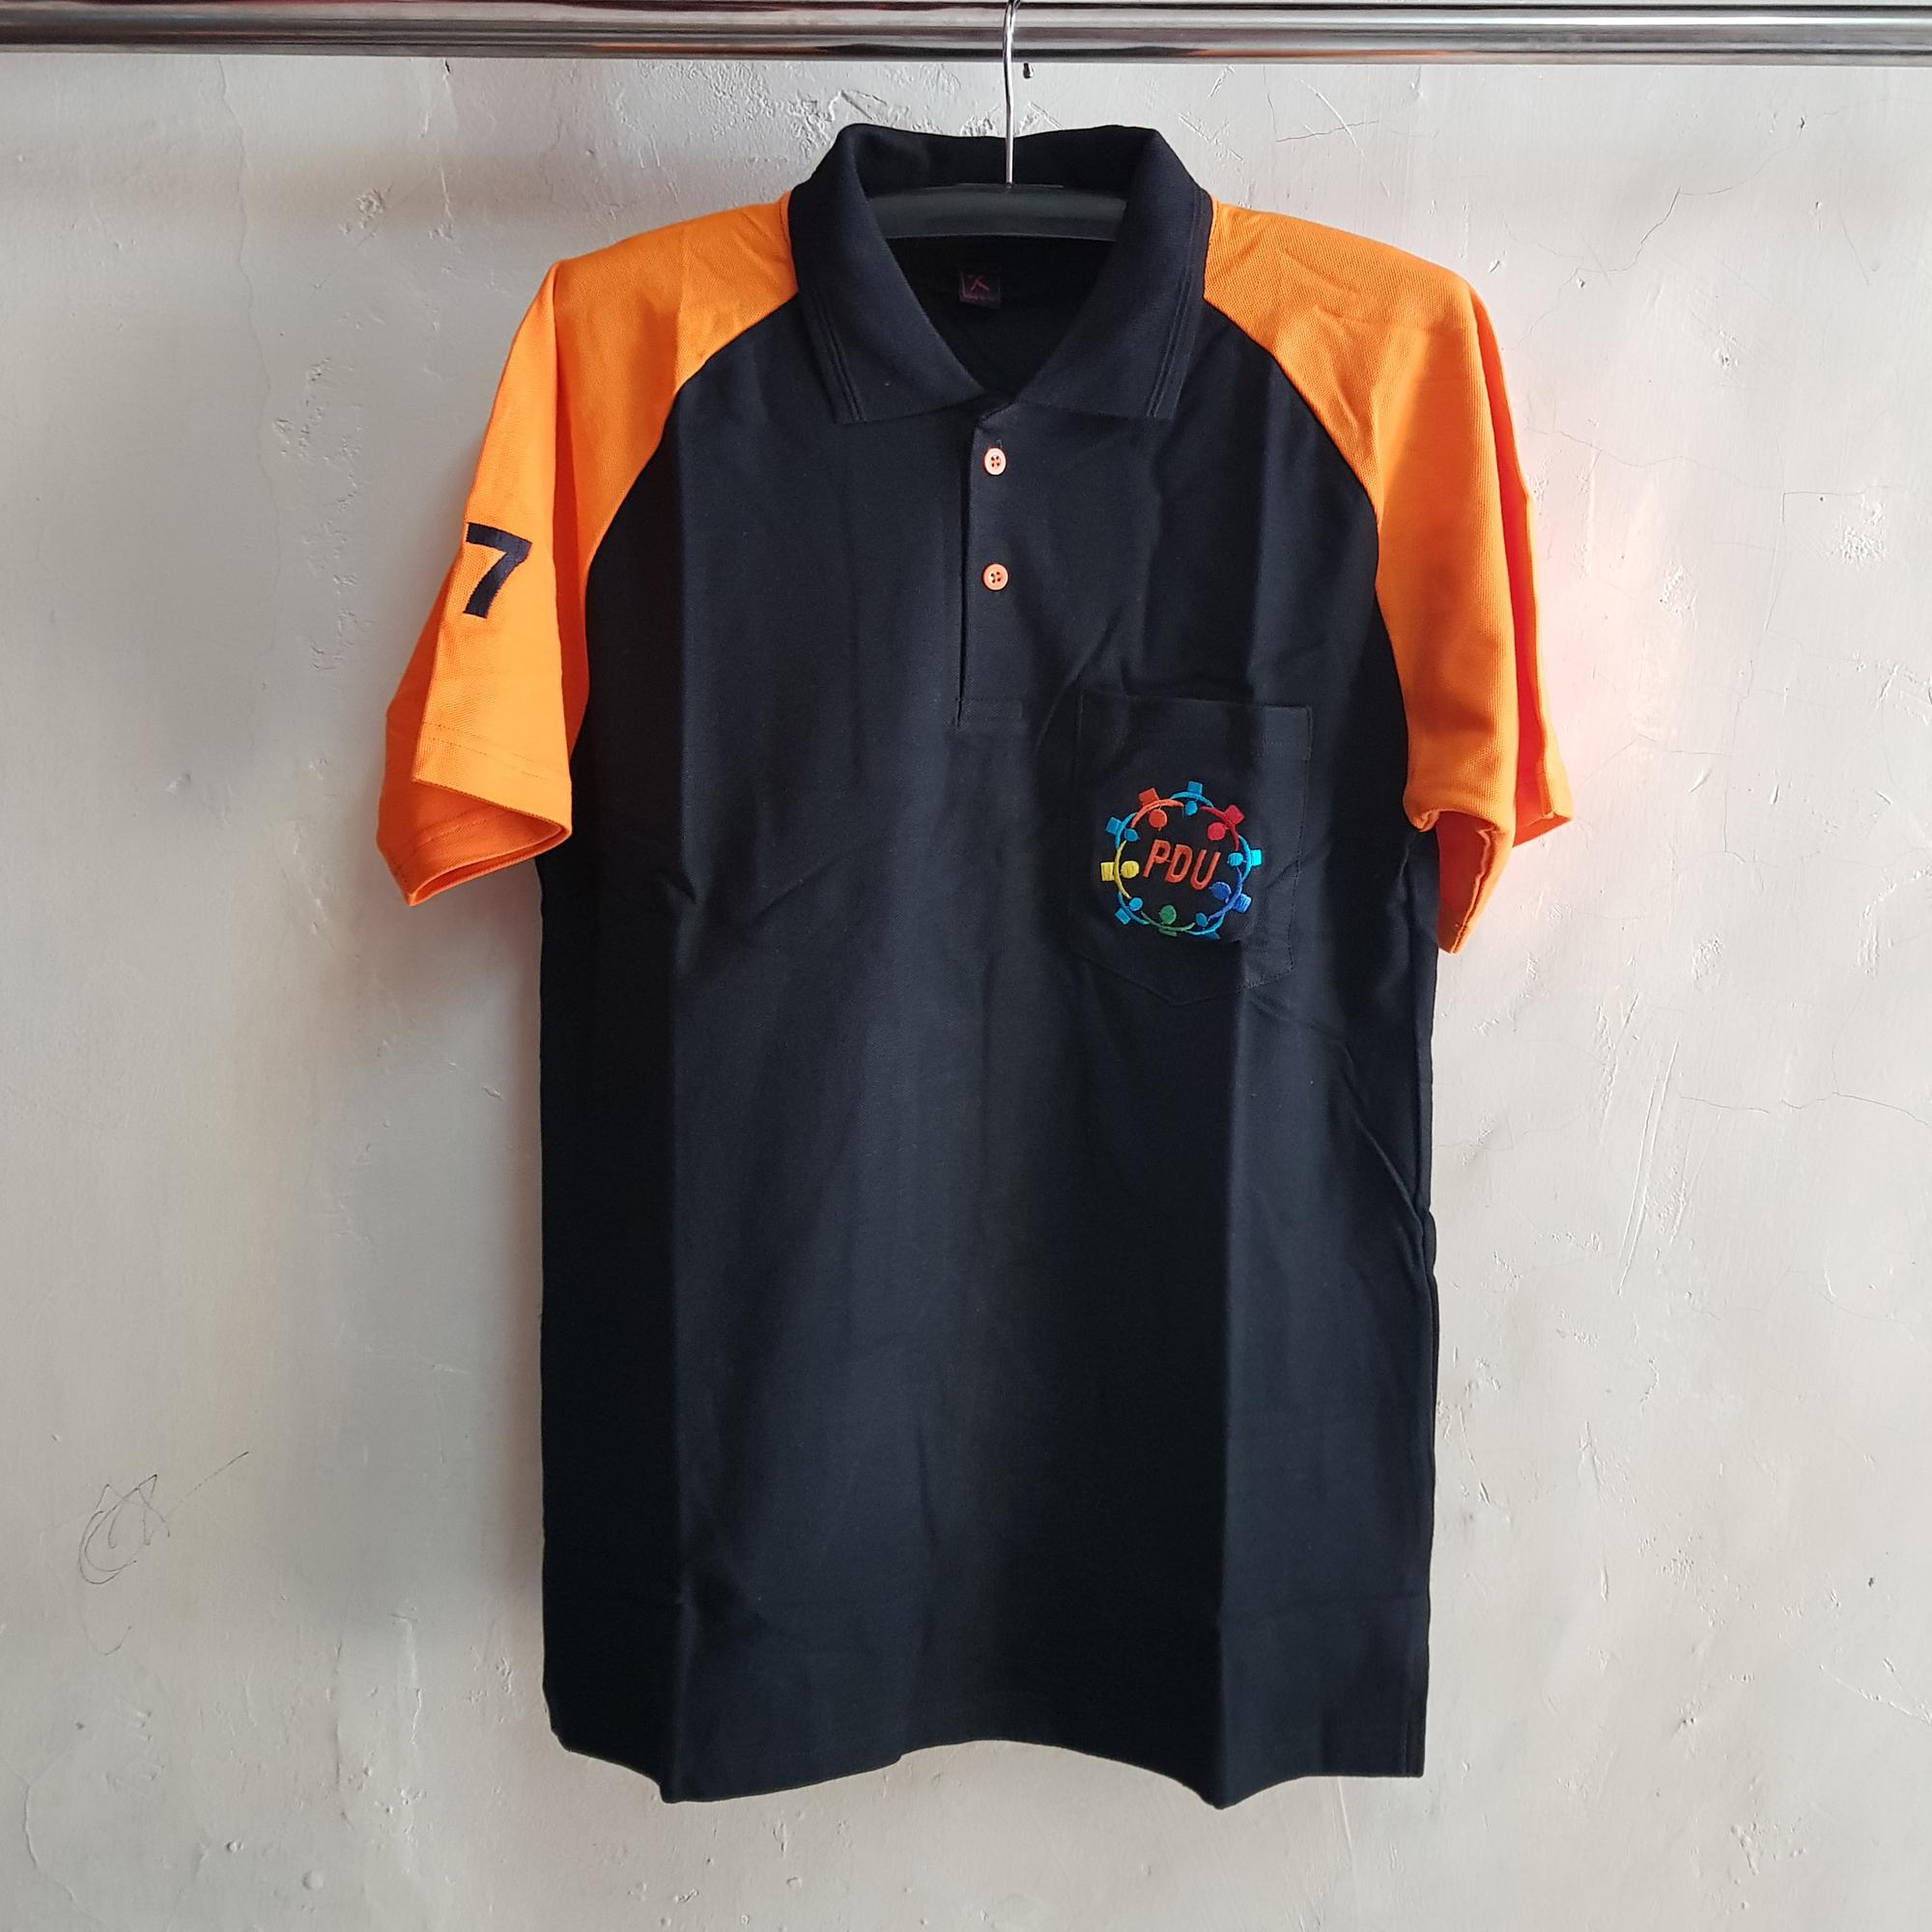 Seragam Poloshirt Lacoste Cotton PDU